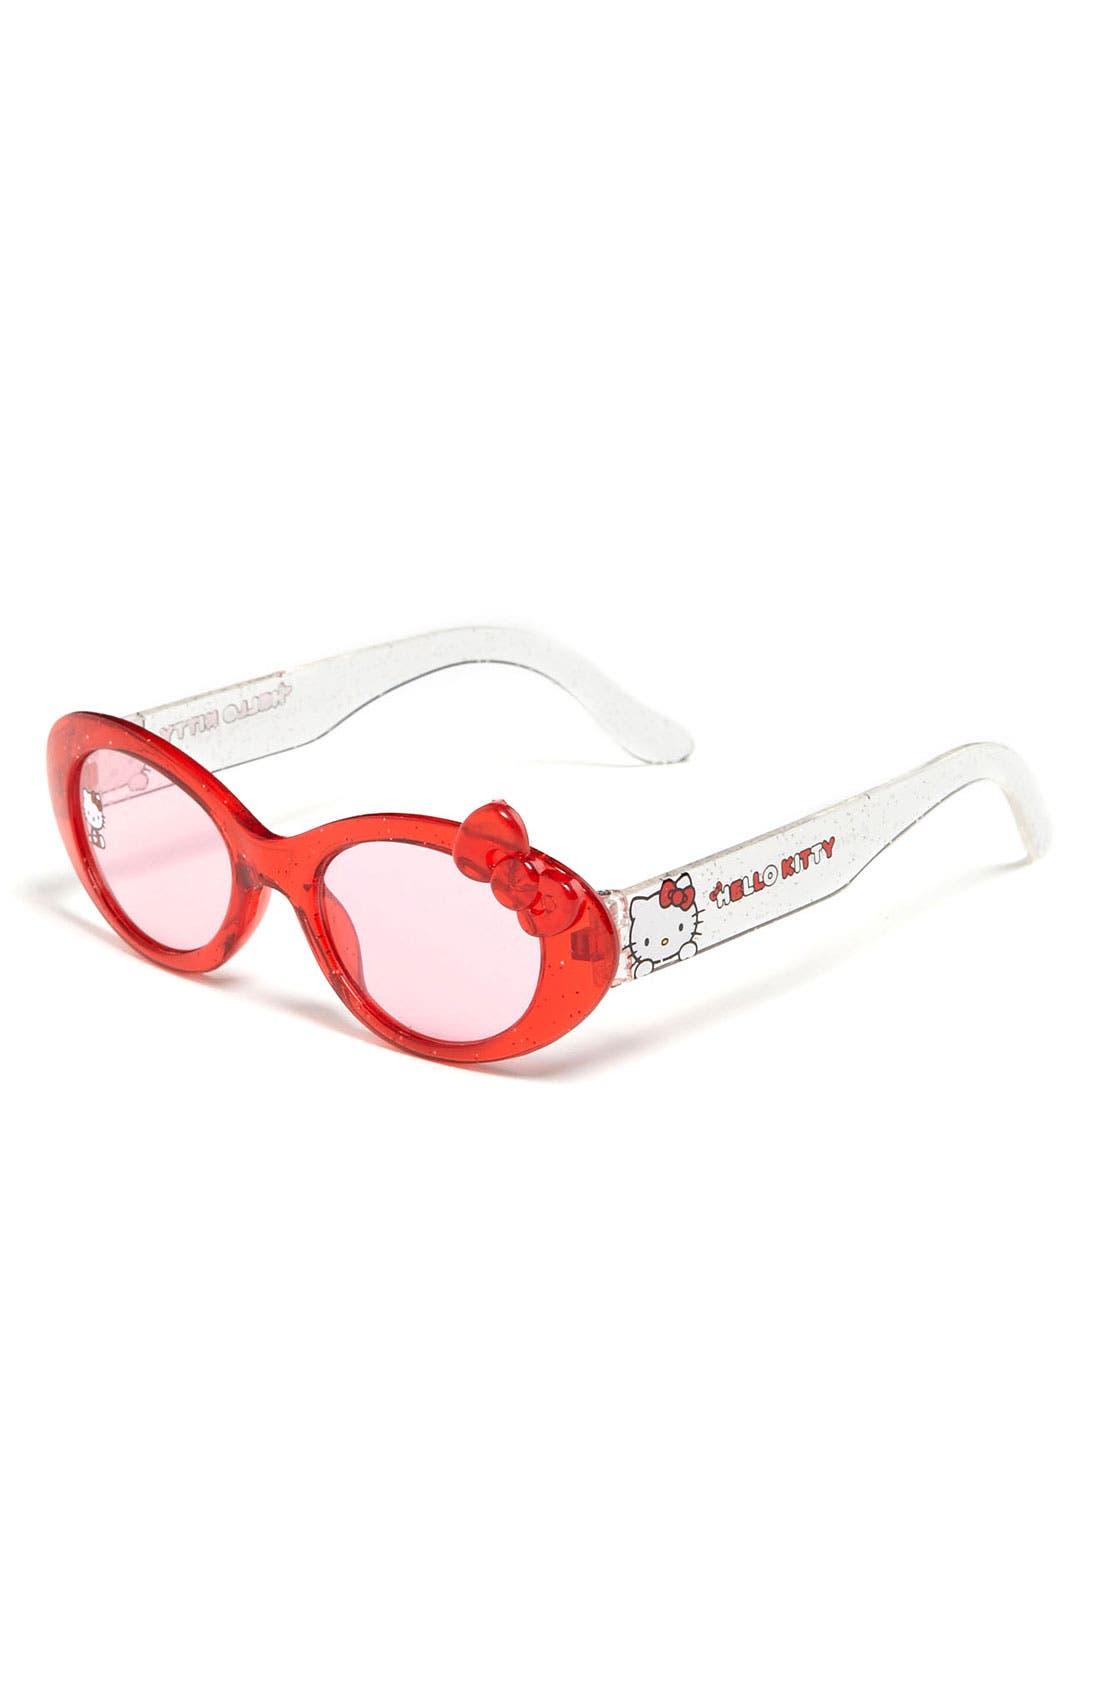 PAN OCEANIC EYEWEAR,                             'Hello Kitty<sup>®</sup>' Sunglasses,                             Main thumbnail 1, color,                             600